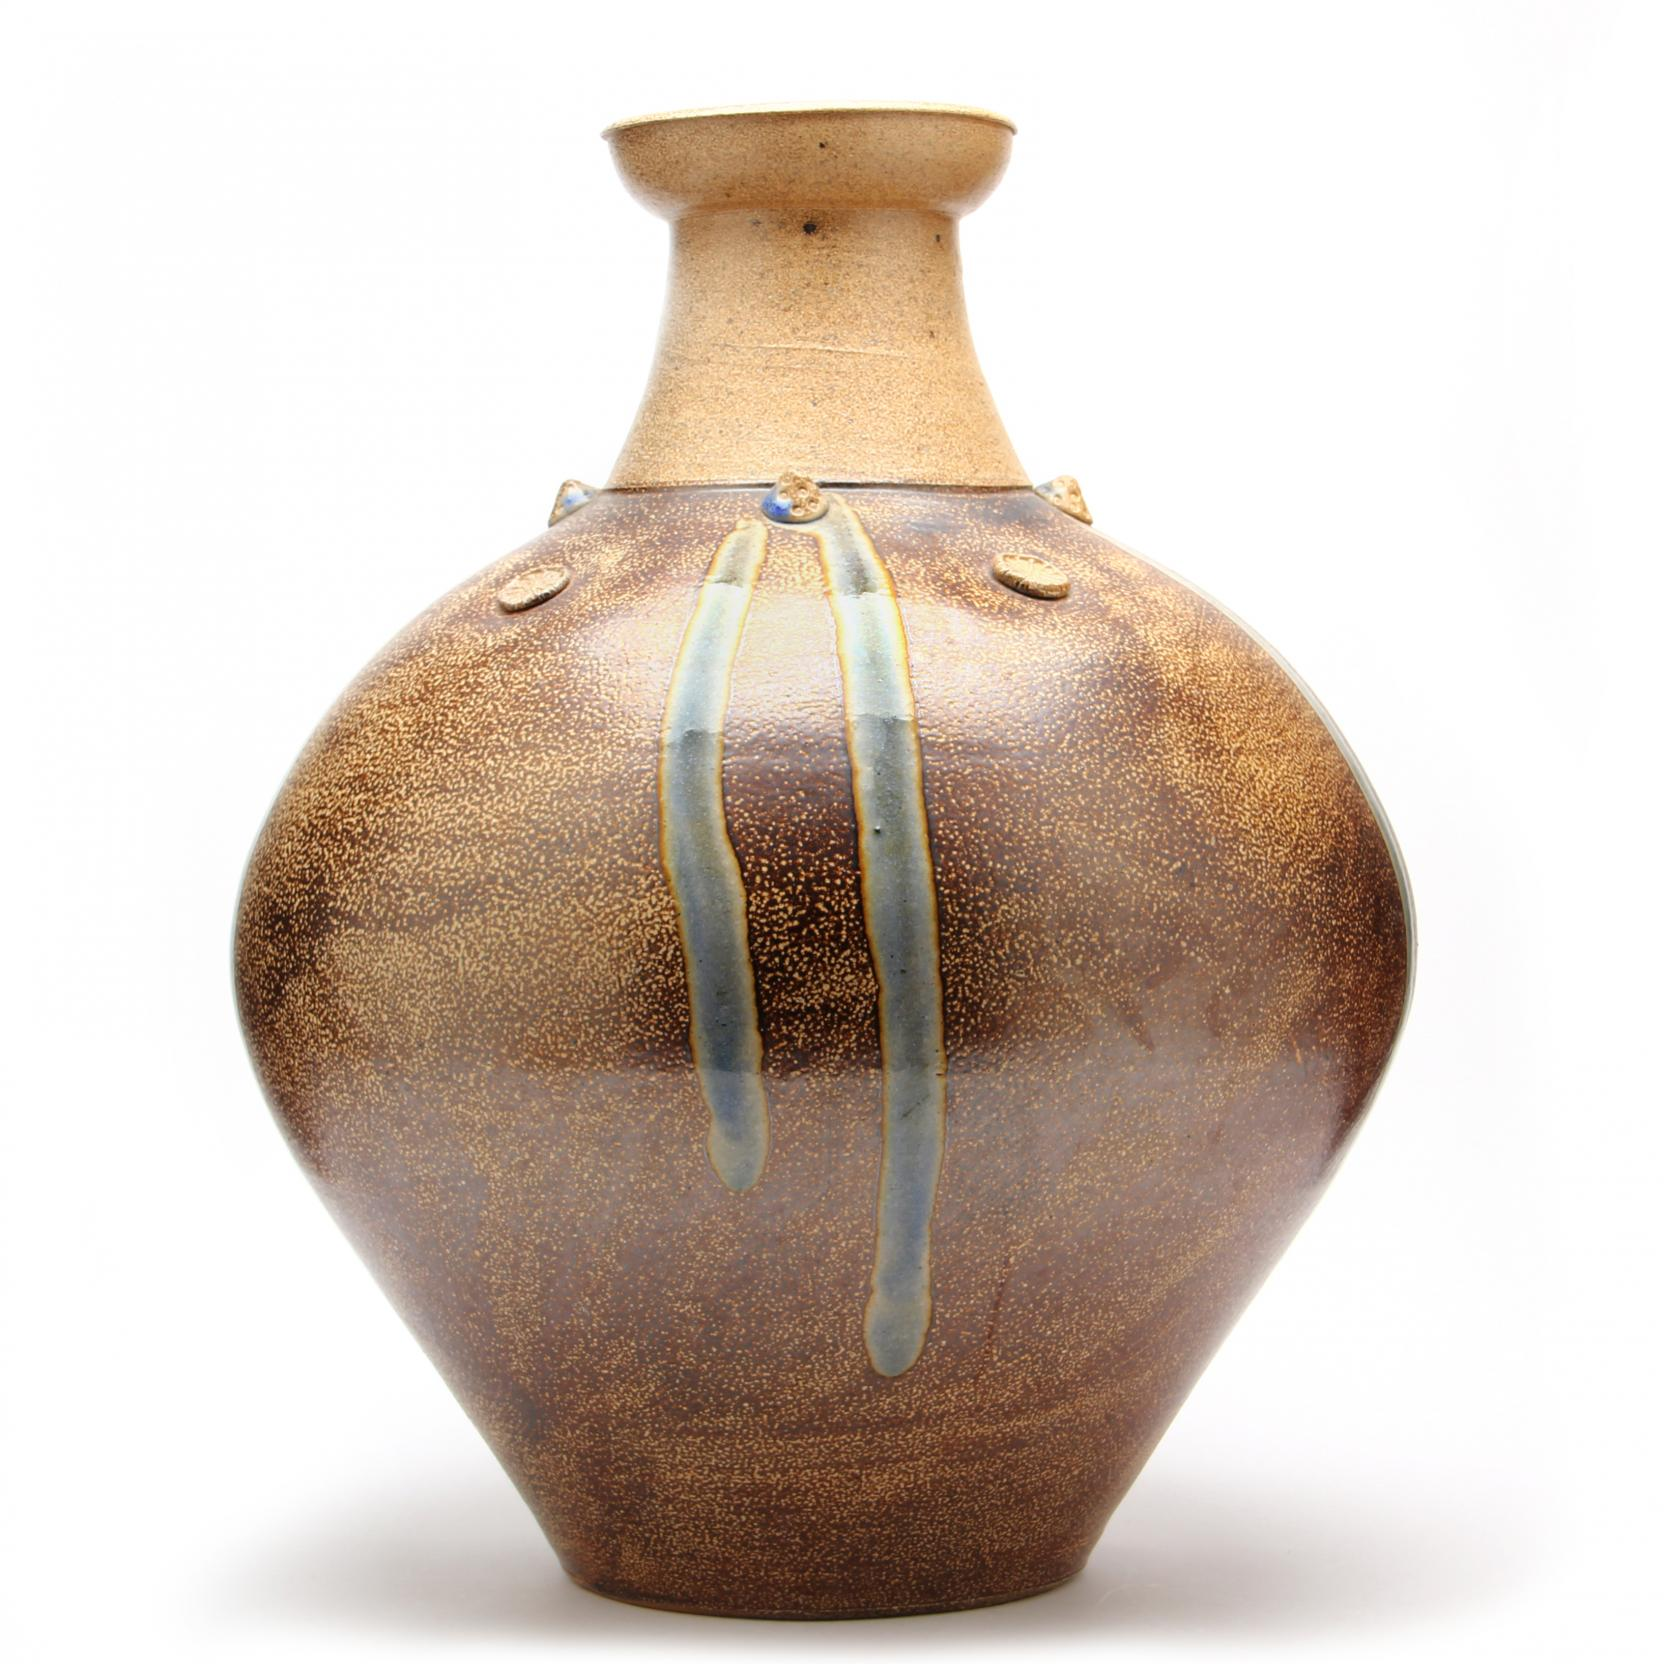 mark-hewitt-pottery-large-floor-vase